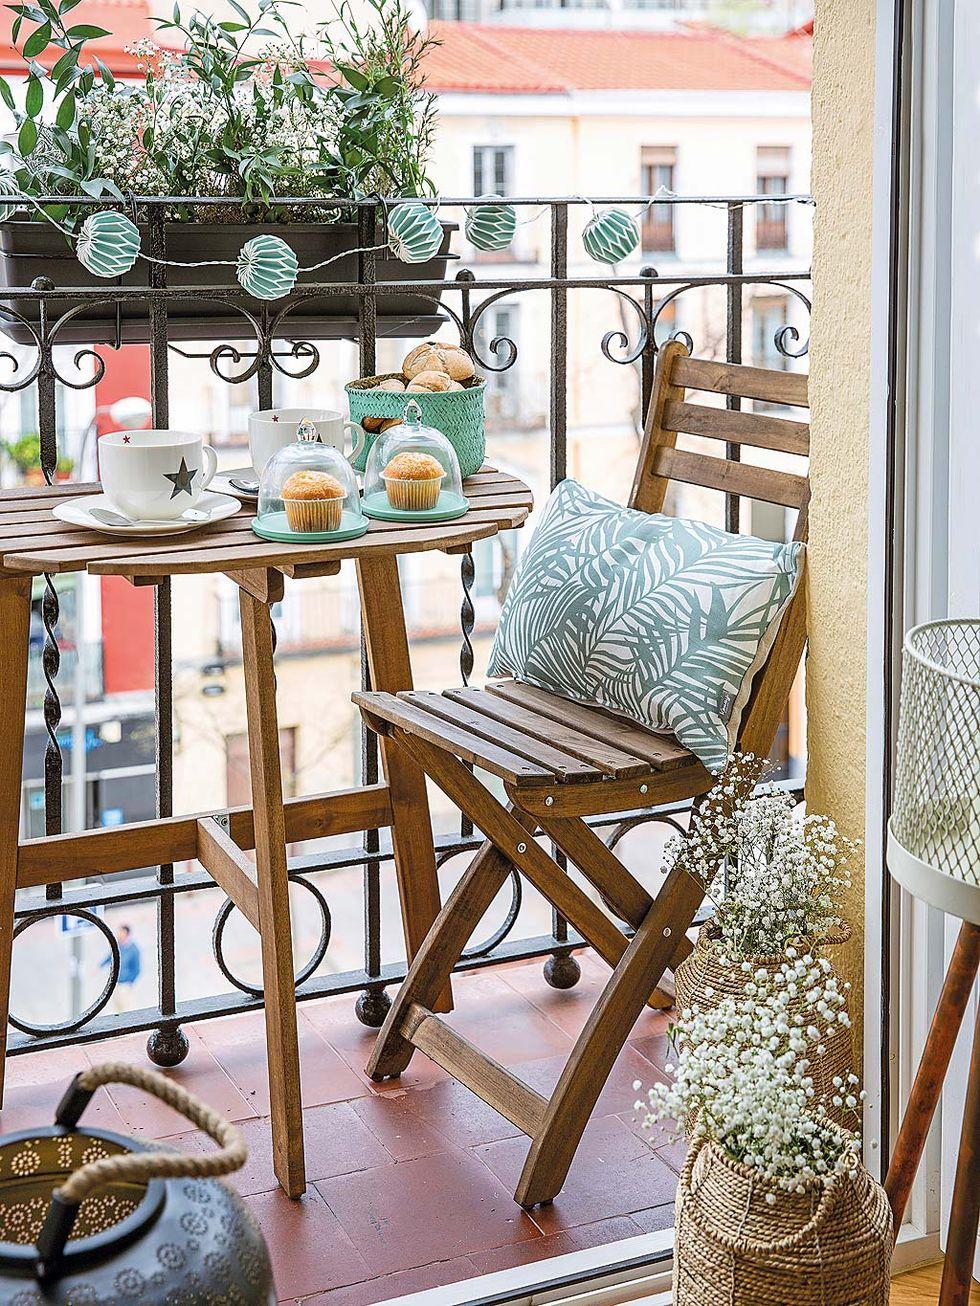 muebles-plegables-en-la-terraza